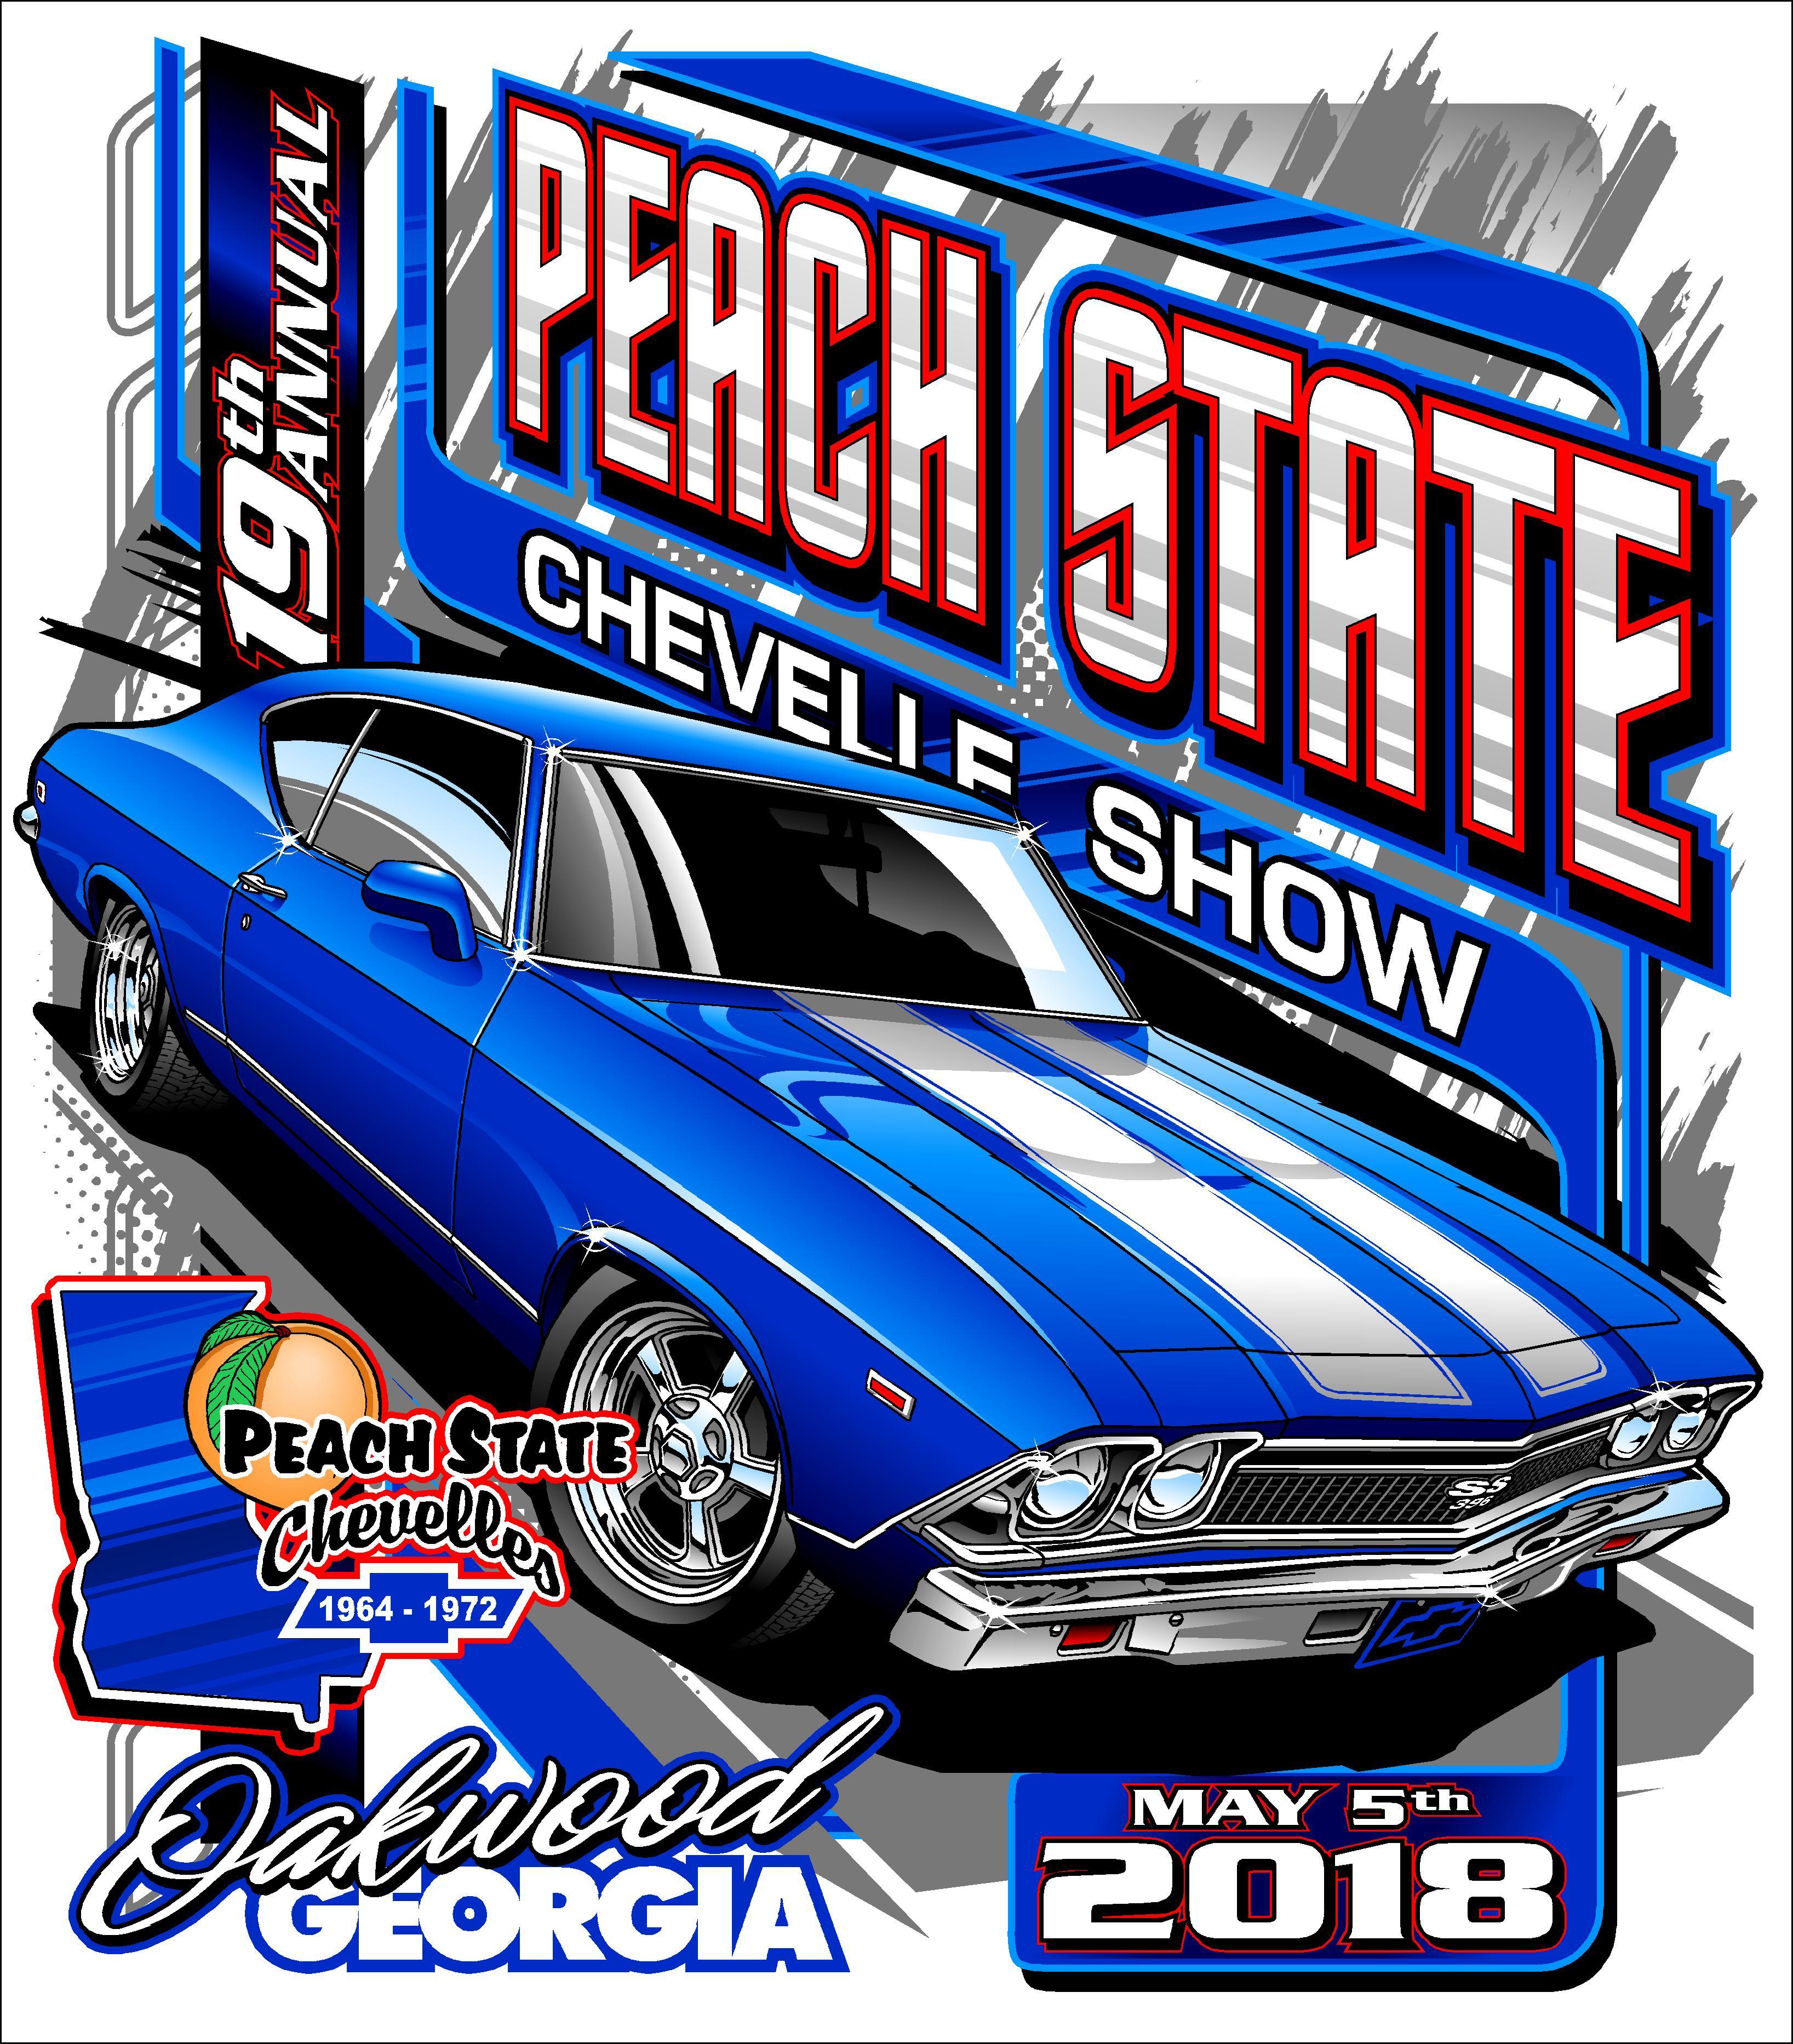 Peach State Chevelle Show Peach State Chevelles